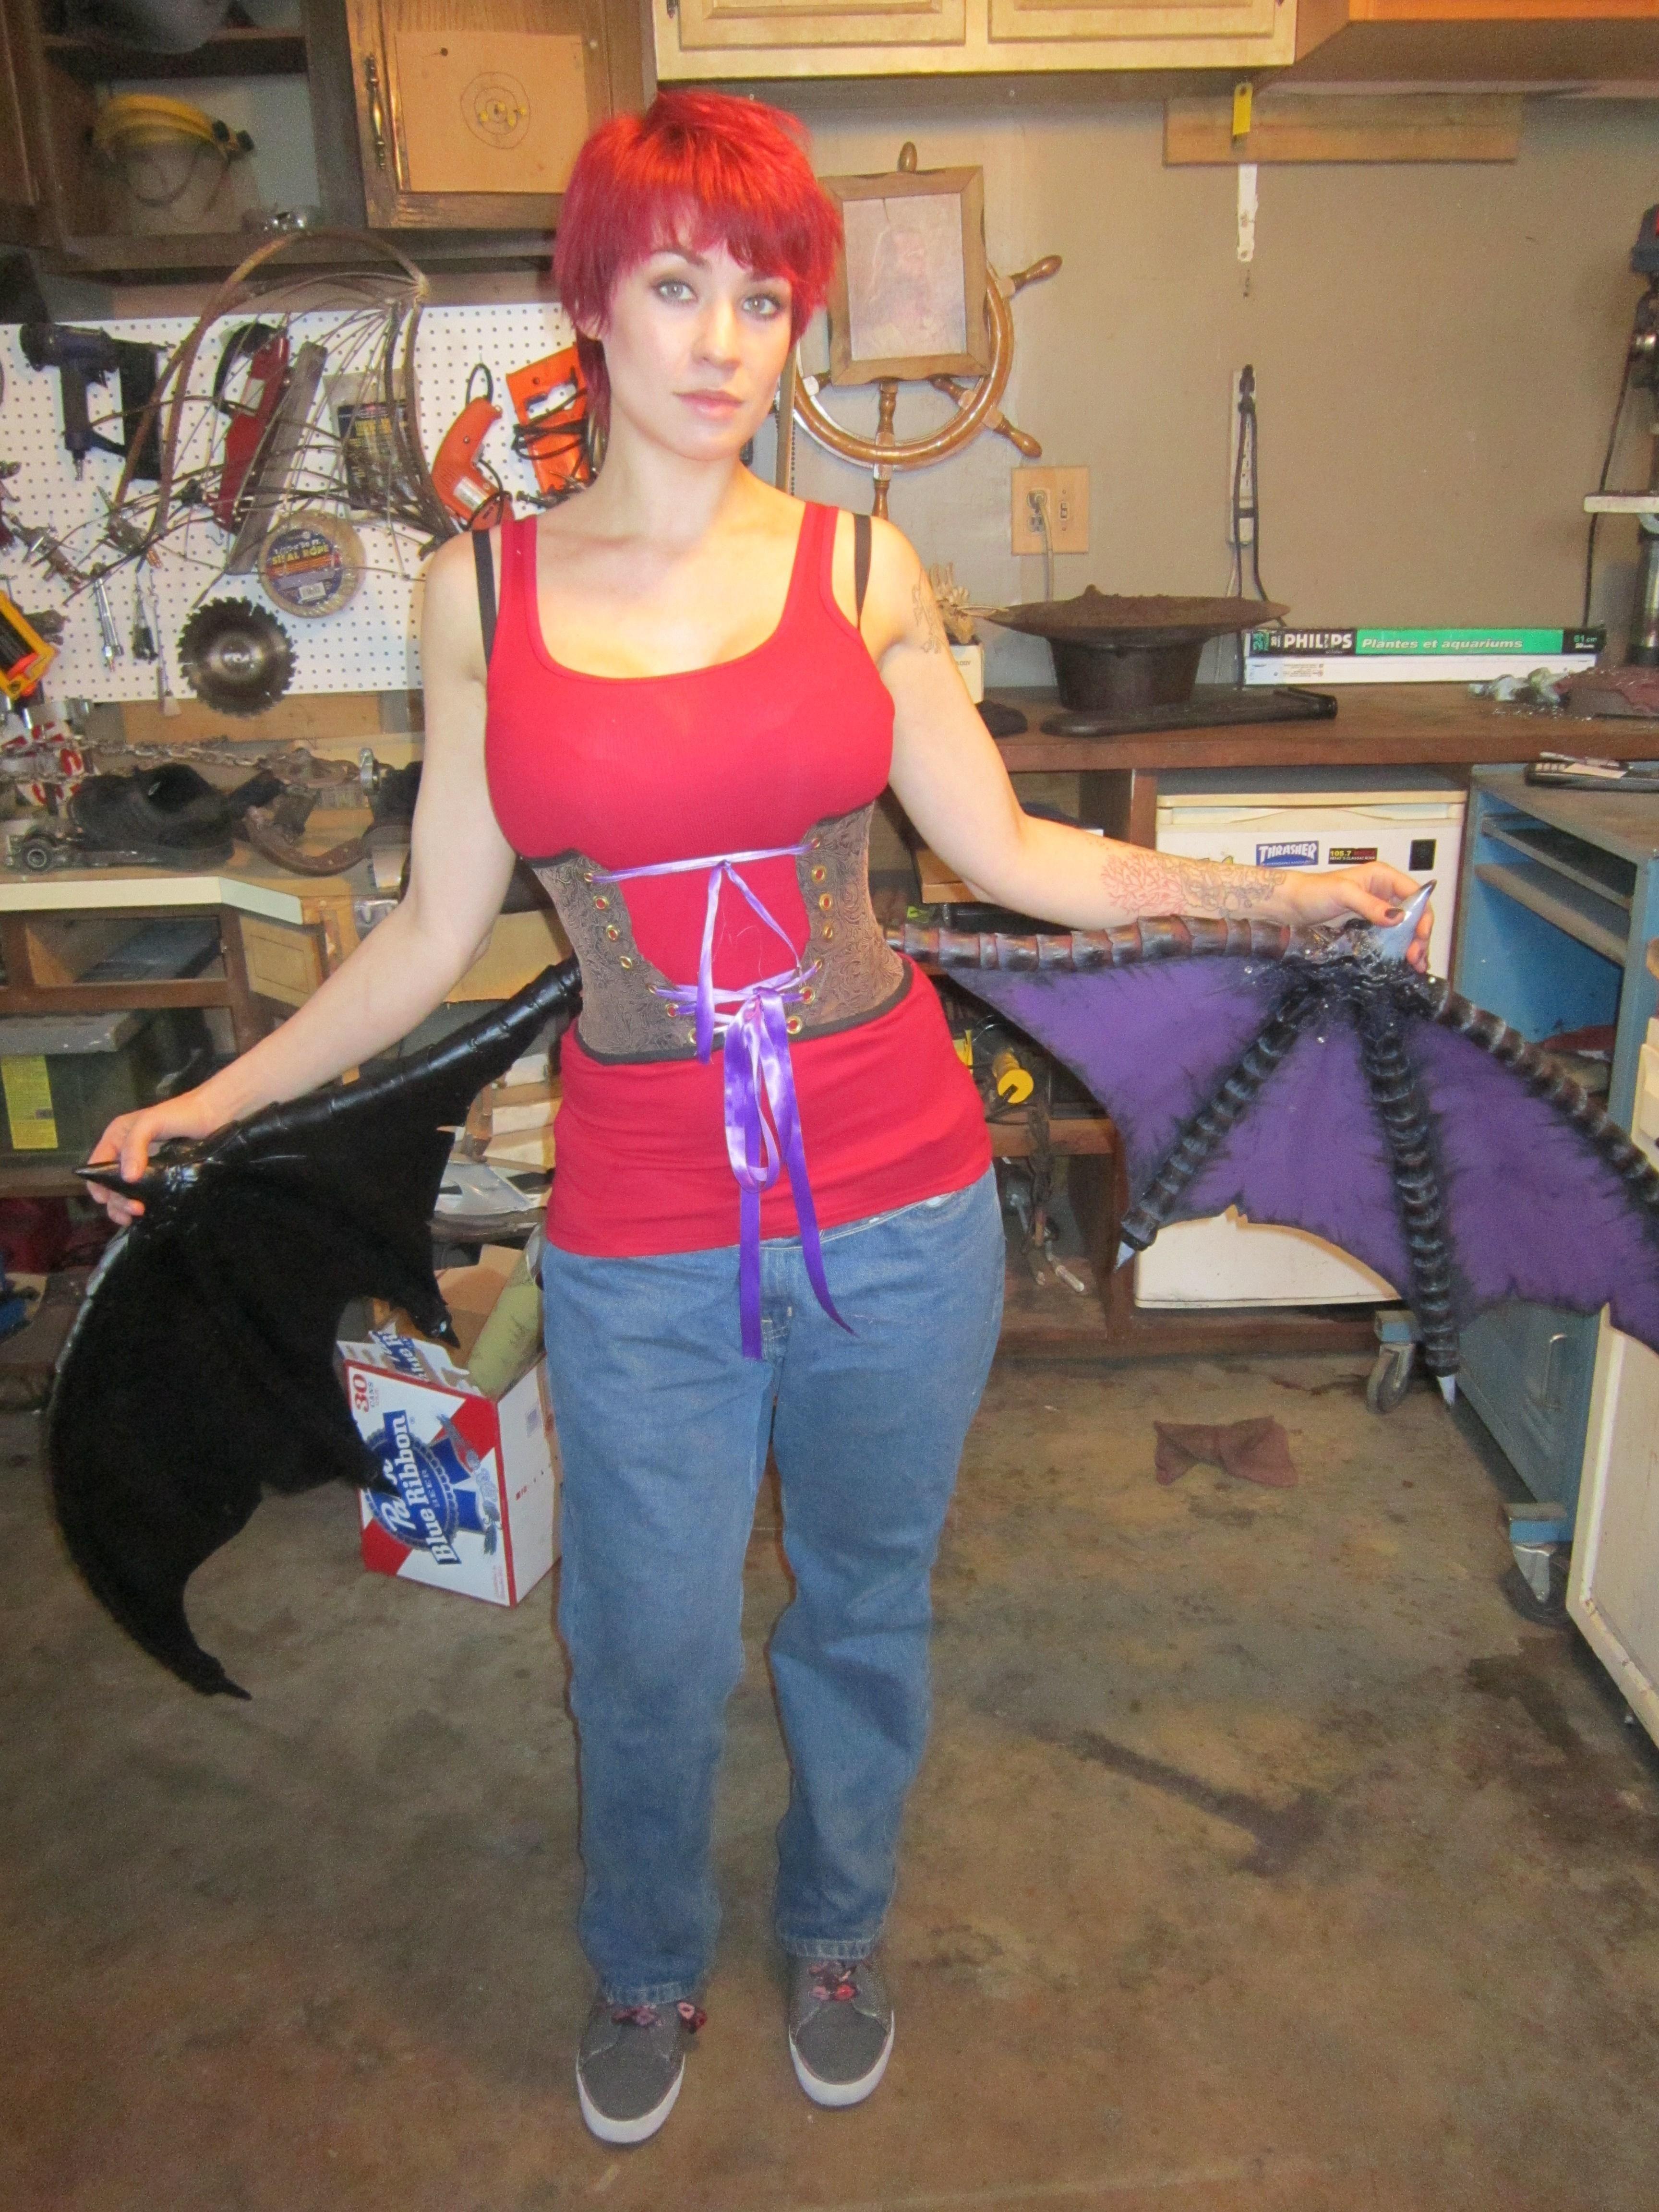 Diy morrigan aensland costume wing harness diy halloween diy morrigan aensland costume wing harness diy halloween solutioingenieria Image collections